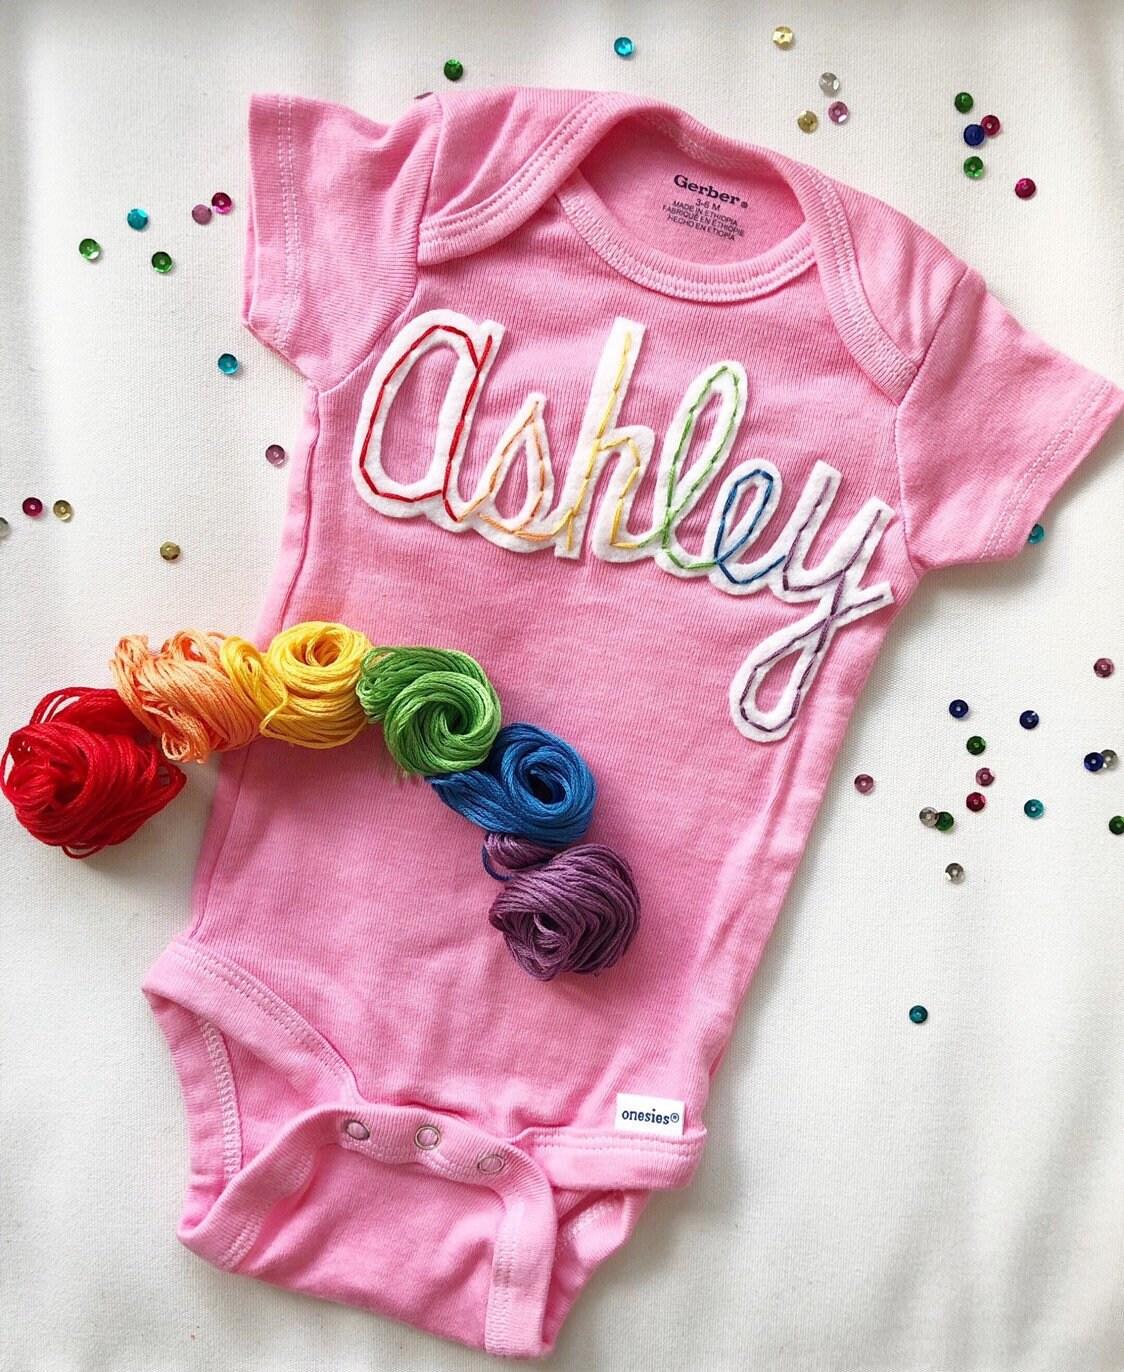 0f6729d1a Rainbow Baby Onesie Custom Name Onesie Personalized Baby | Etsy